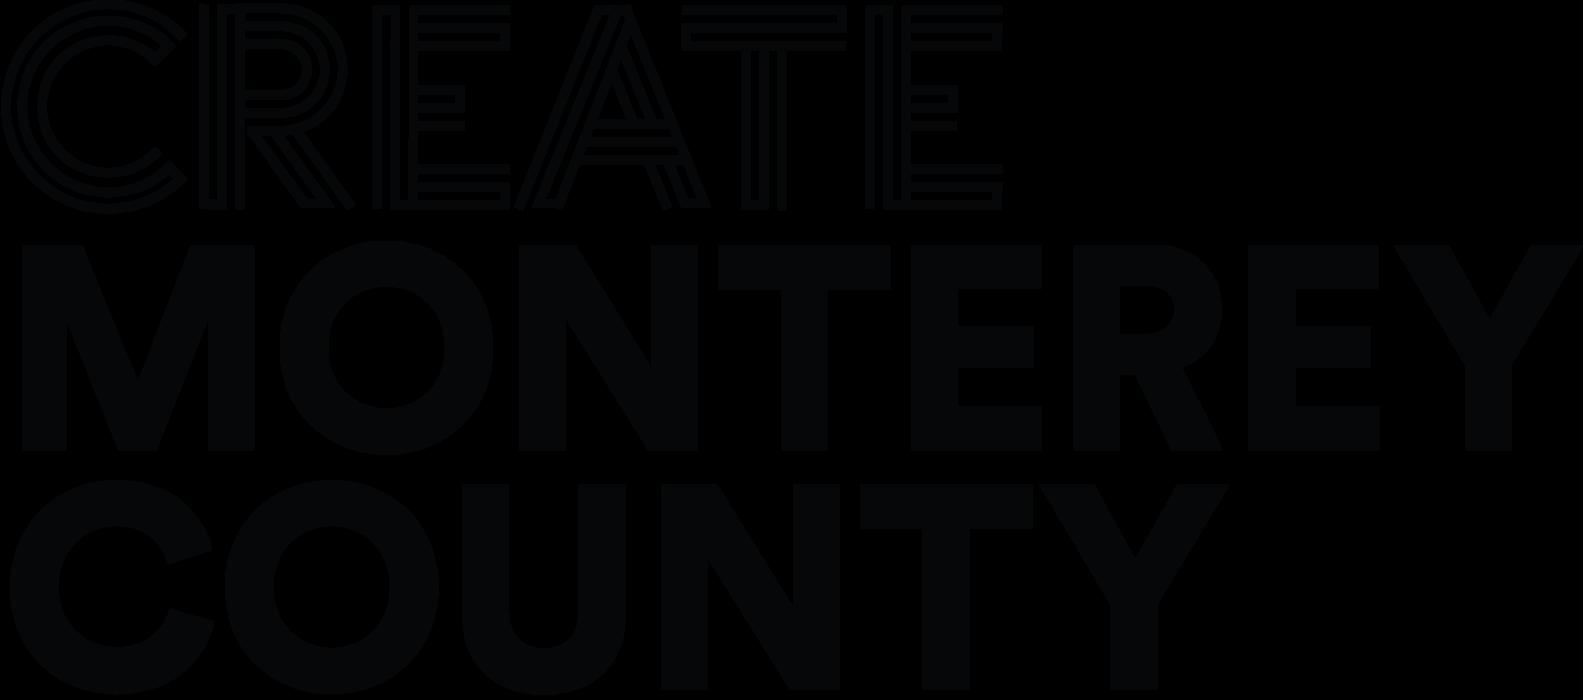 https://secureservercdn.net/198.71.233.51/mgq.552.myftpupload.com/wp-content/uploads/2020/01/Create-Ca-County-Logos-24-e1580494867178.png?time=1590696188